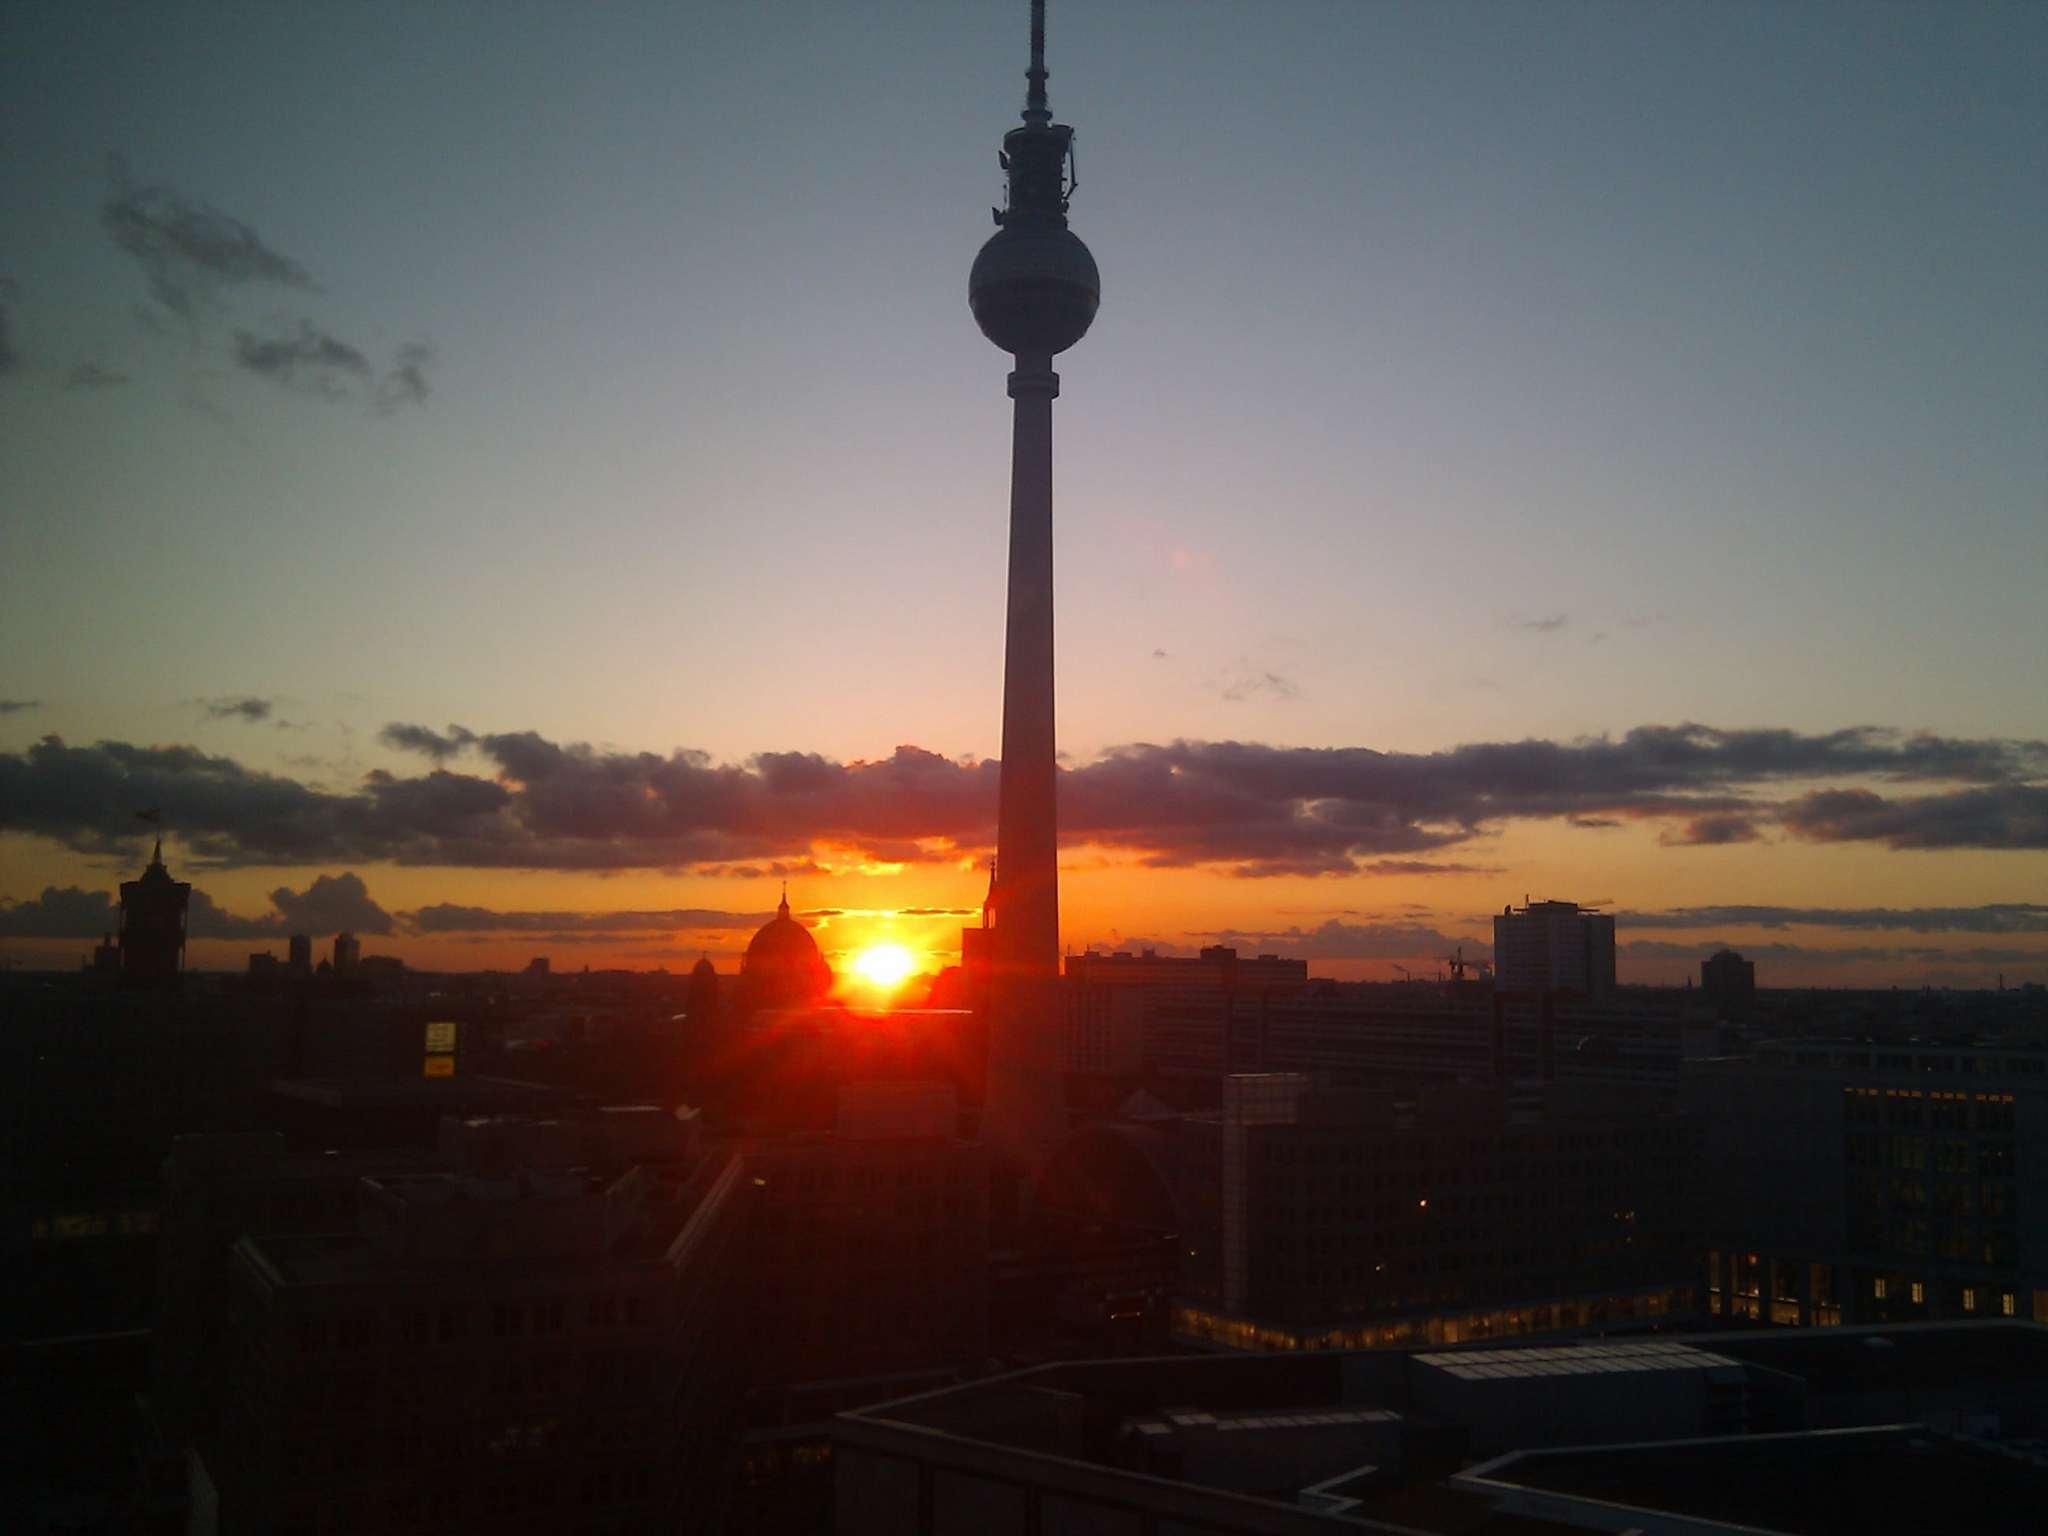 Fernsehturm sunrise